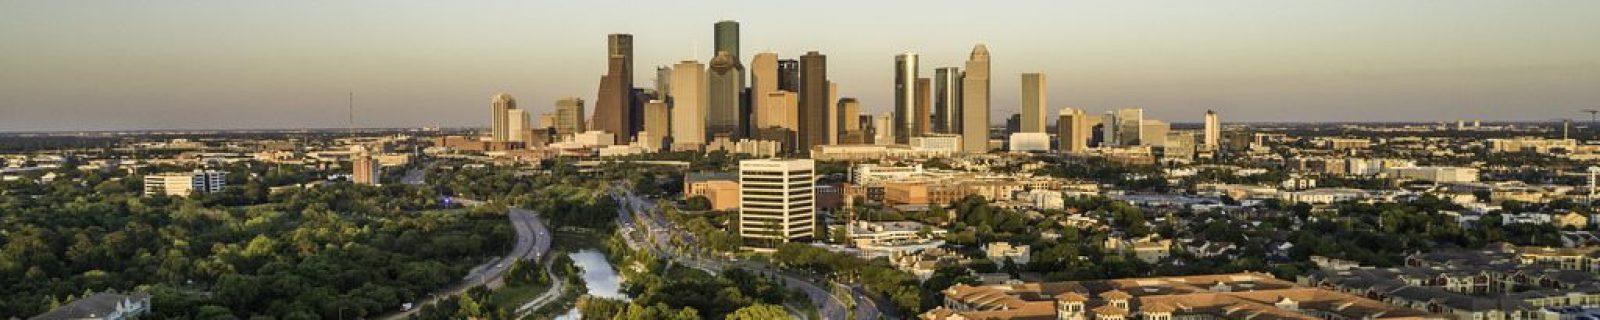 International Christian Church of Houston 日本語 英語 English Japanese 日本人 教会 ヒューストン テキサス インタナショナル クリスチャン チャーチ